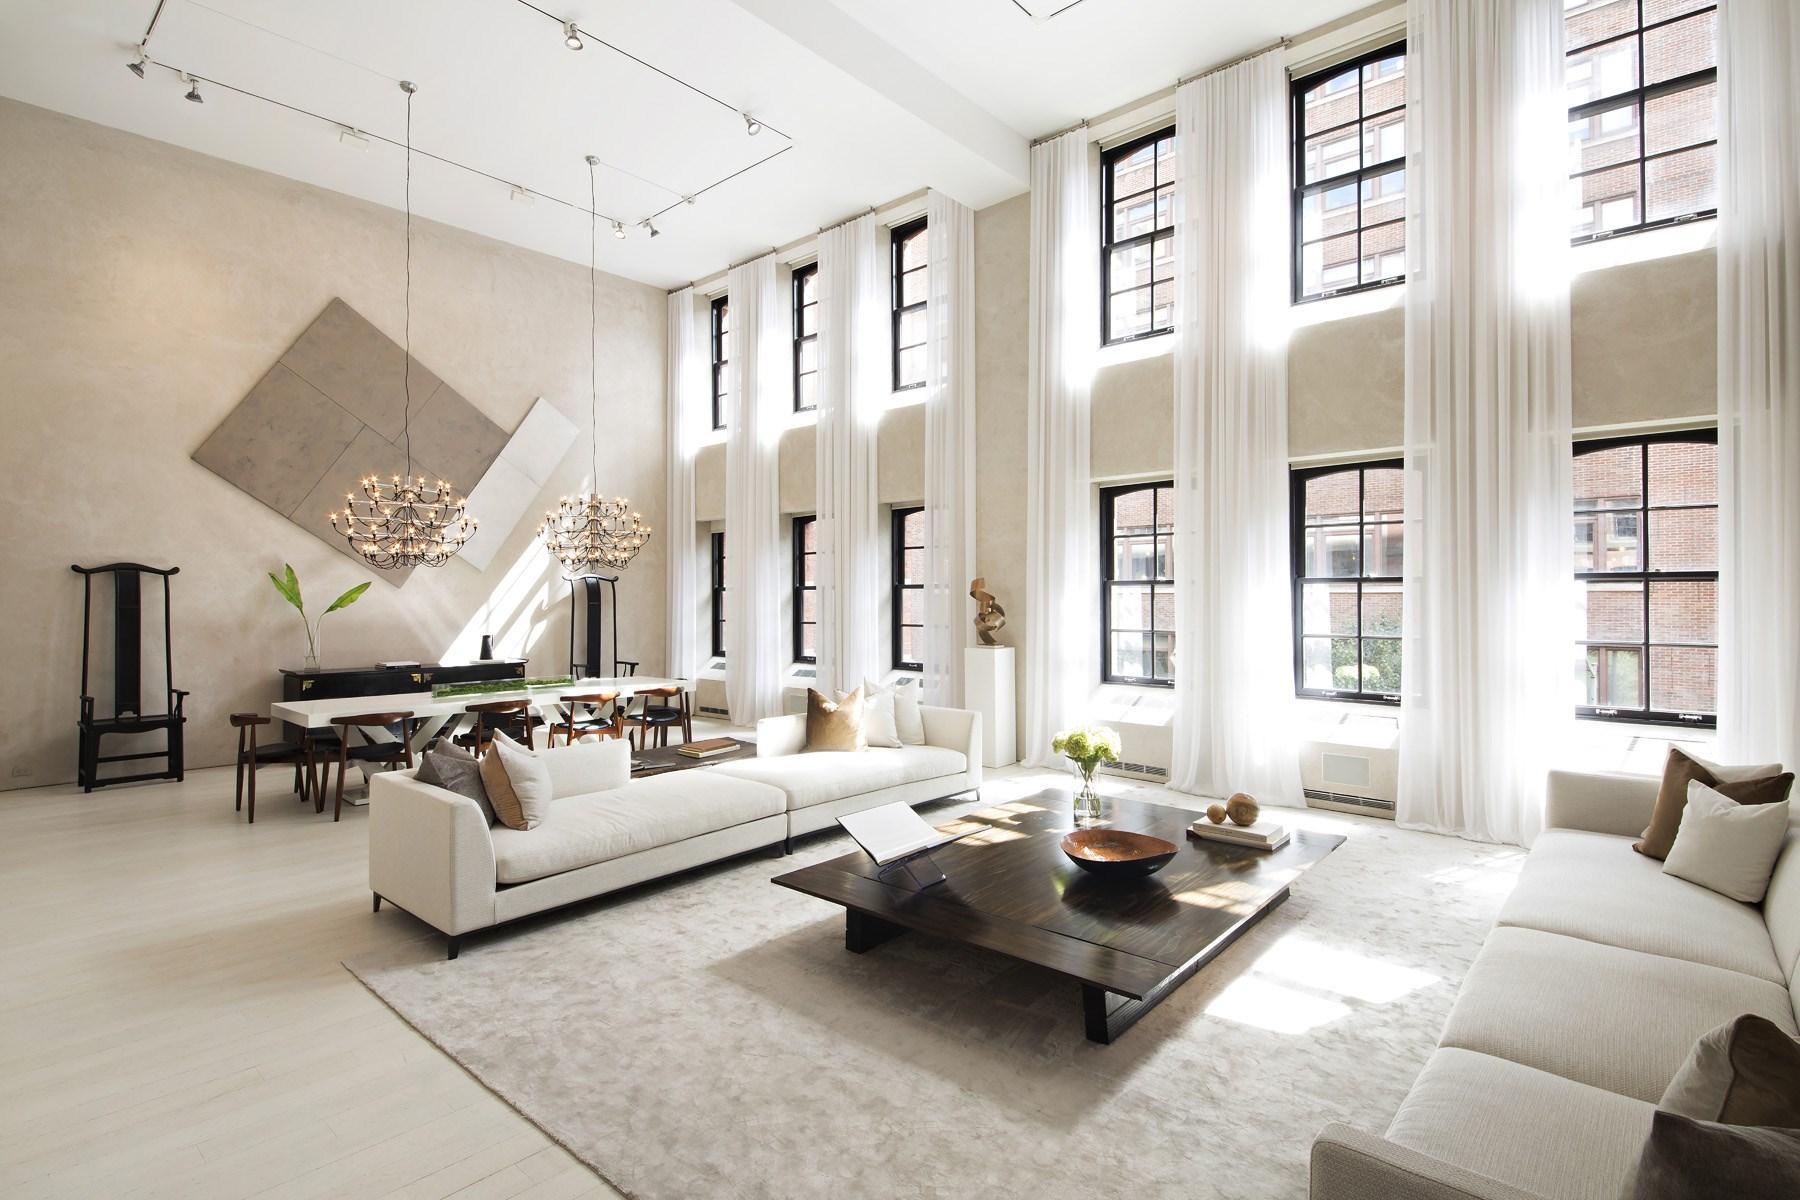 Condominium for Rent at 43 Clarkson Street, 234 43 Clarkson Street Apt 234A West Village, New York, New York, 10014 United States